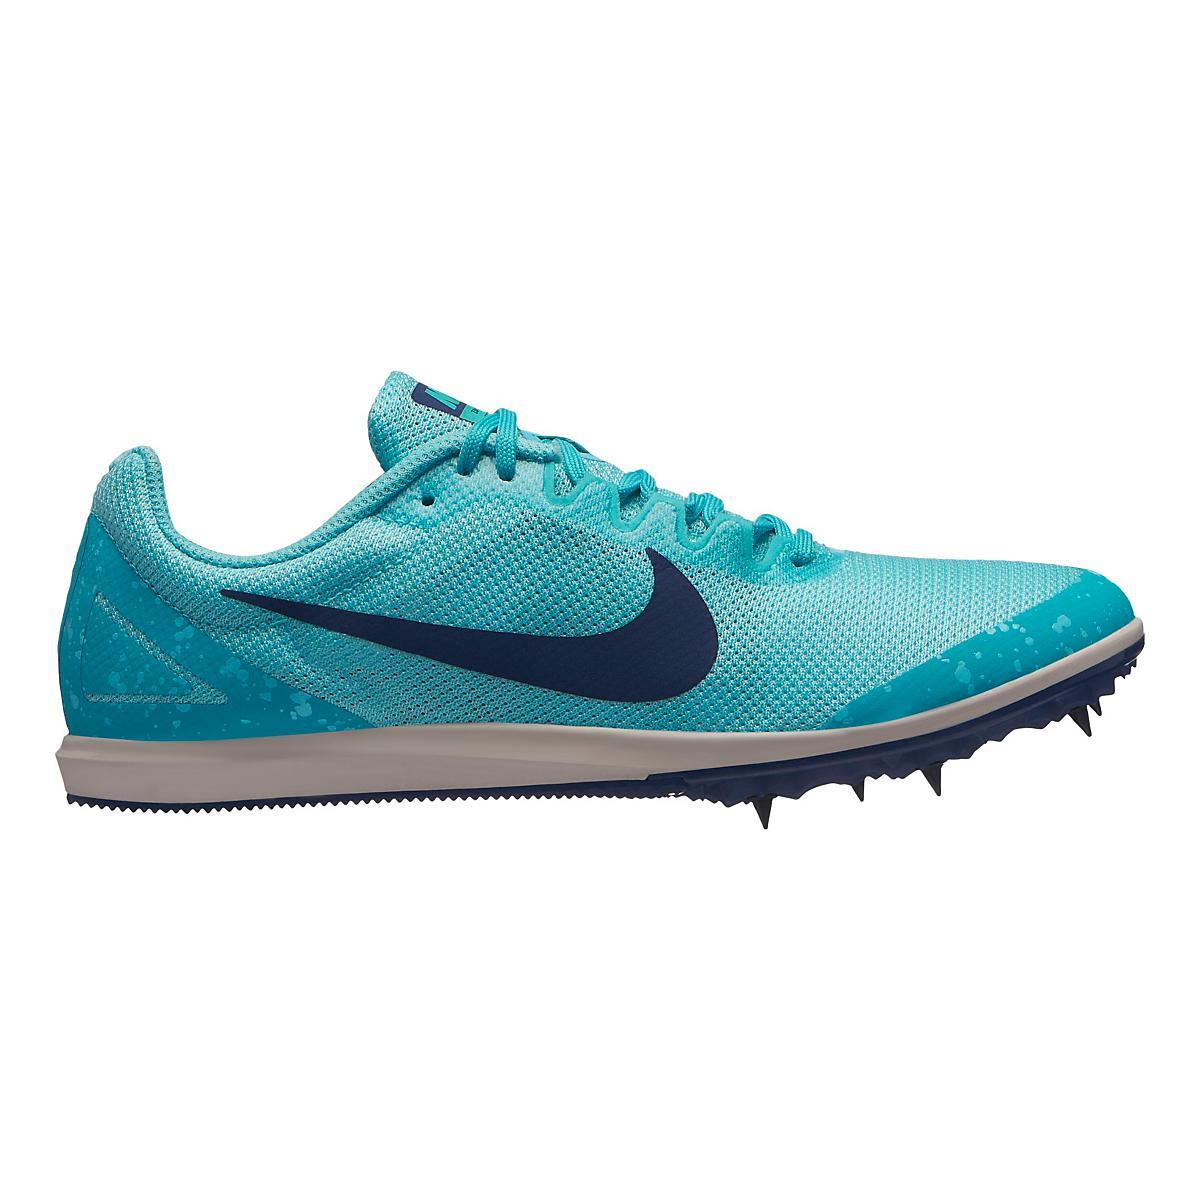 fertilizante Mascotas Interprete  Womens Nike Zoom Rival D 10 Track and Field Shoe at Road Runner Sports